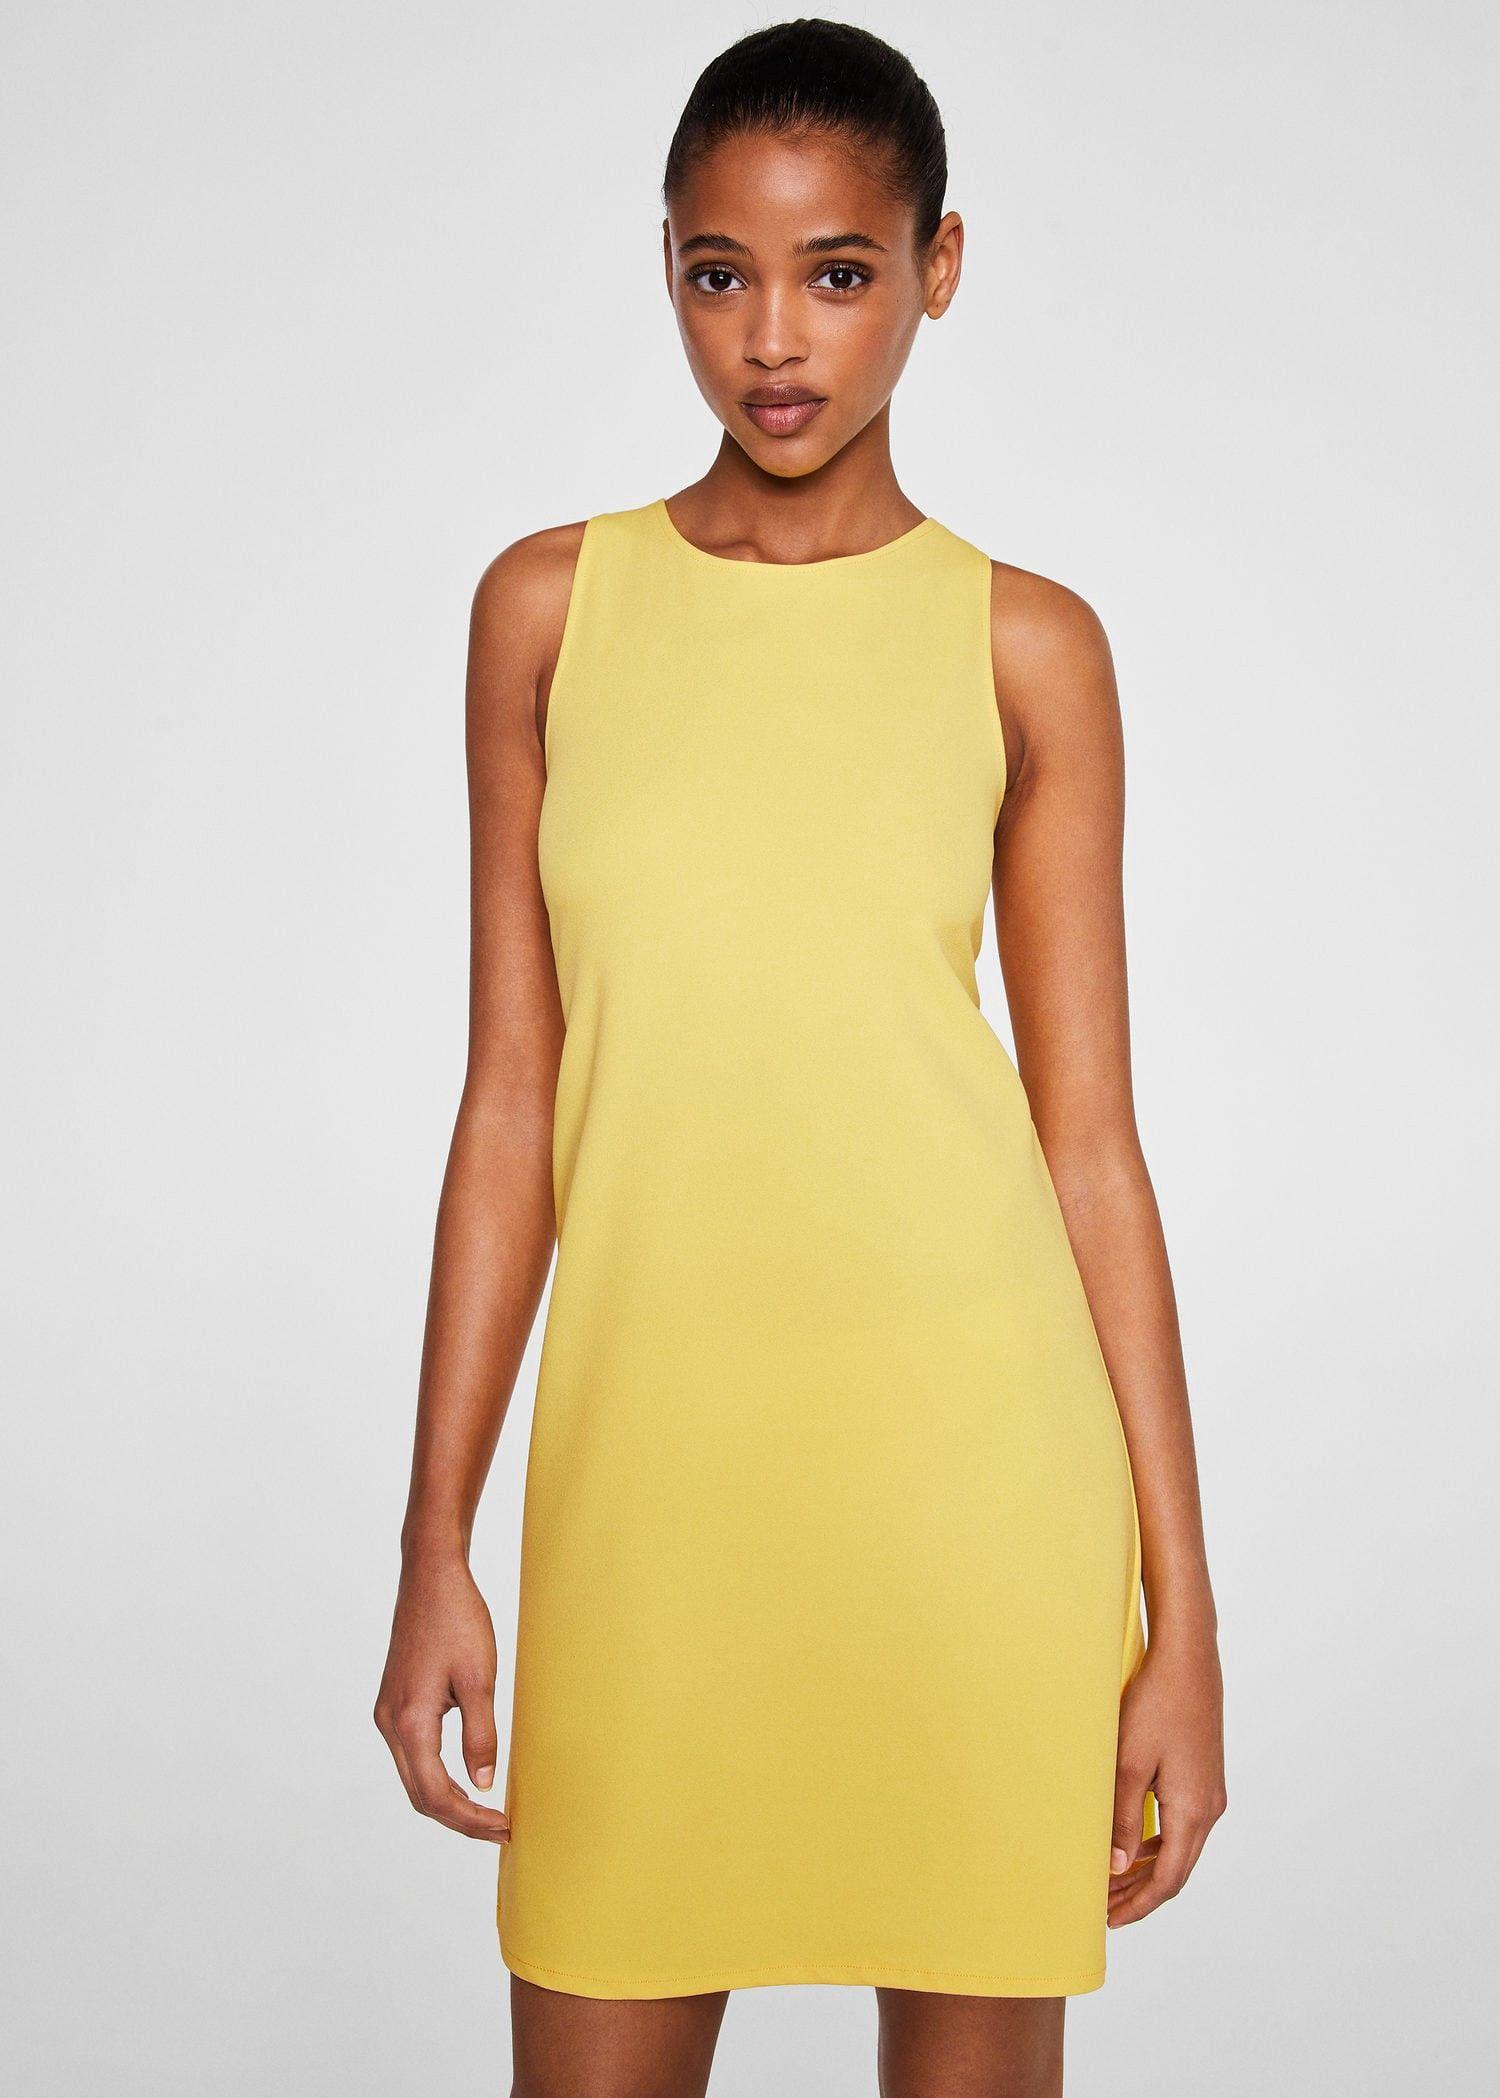 Yellow dress for women  Mango Back Vent Dress  Women  Yellow   Products  Pinterest